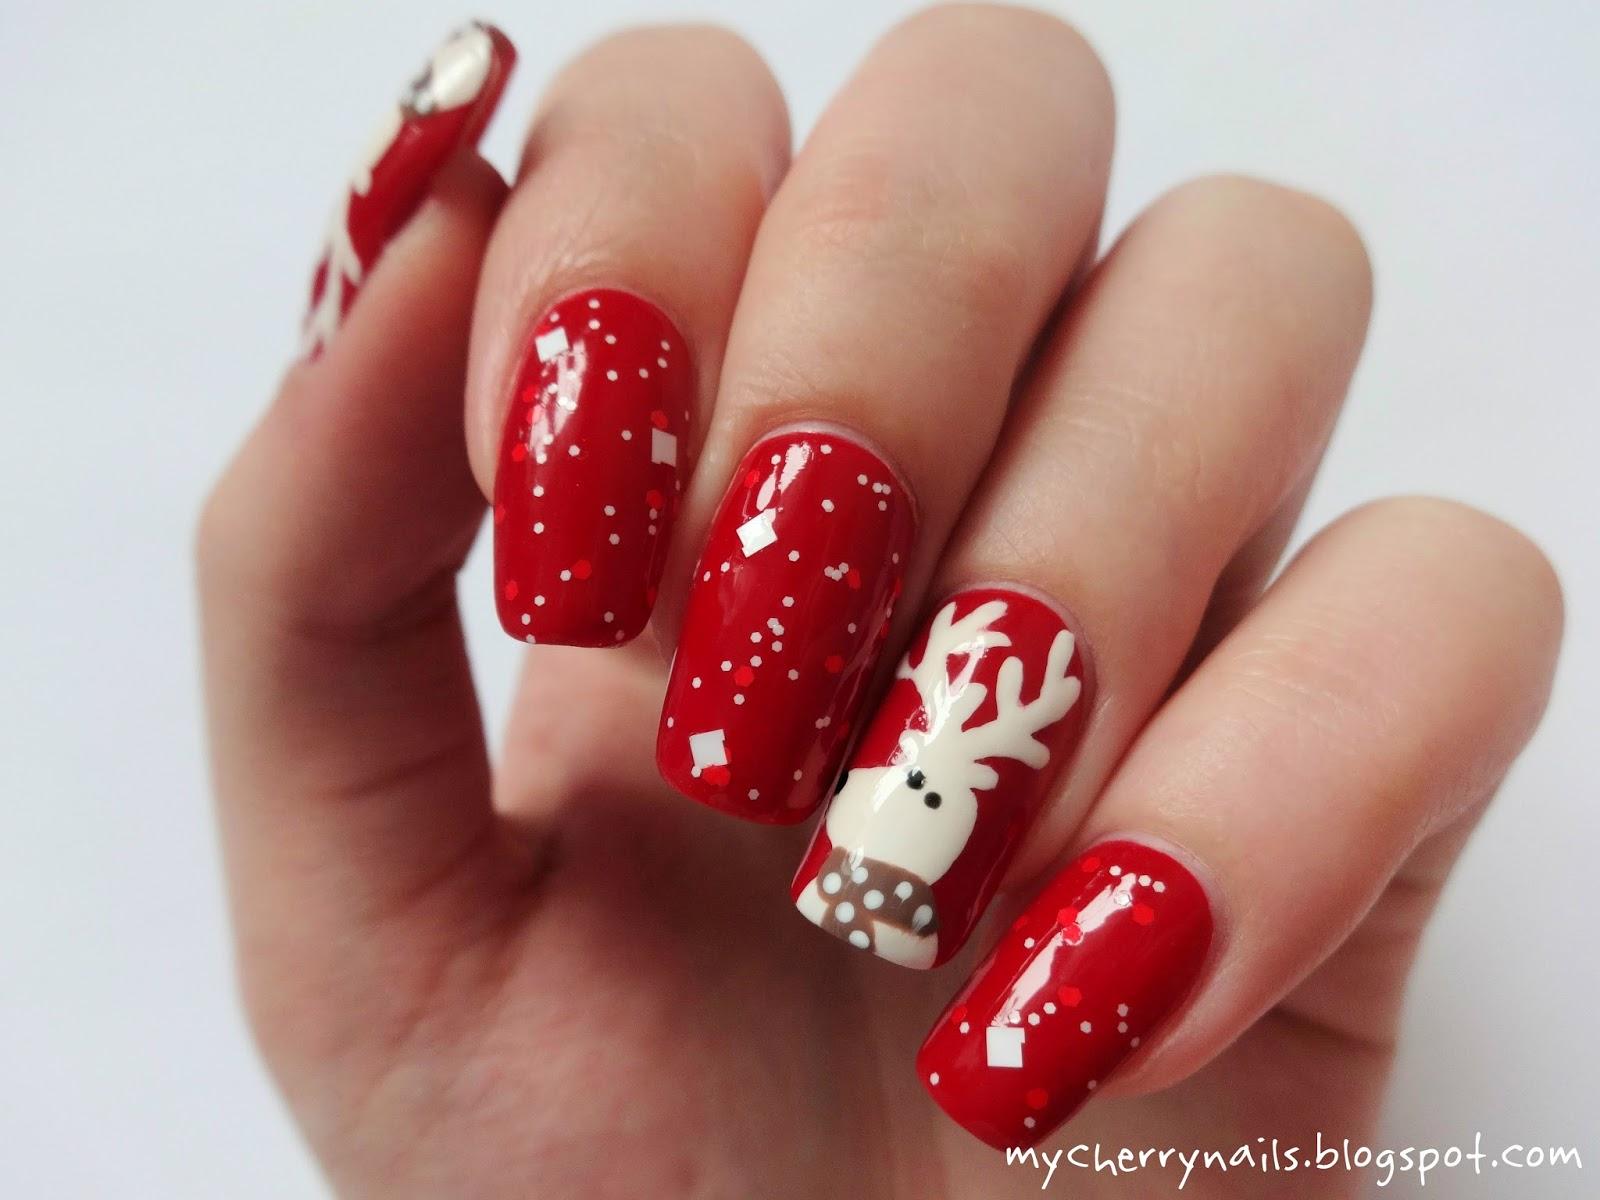 Cherry Nails Zdobienie Paznokci Naturalnych Renifery